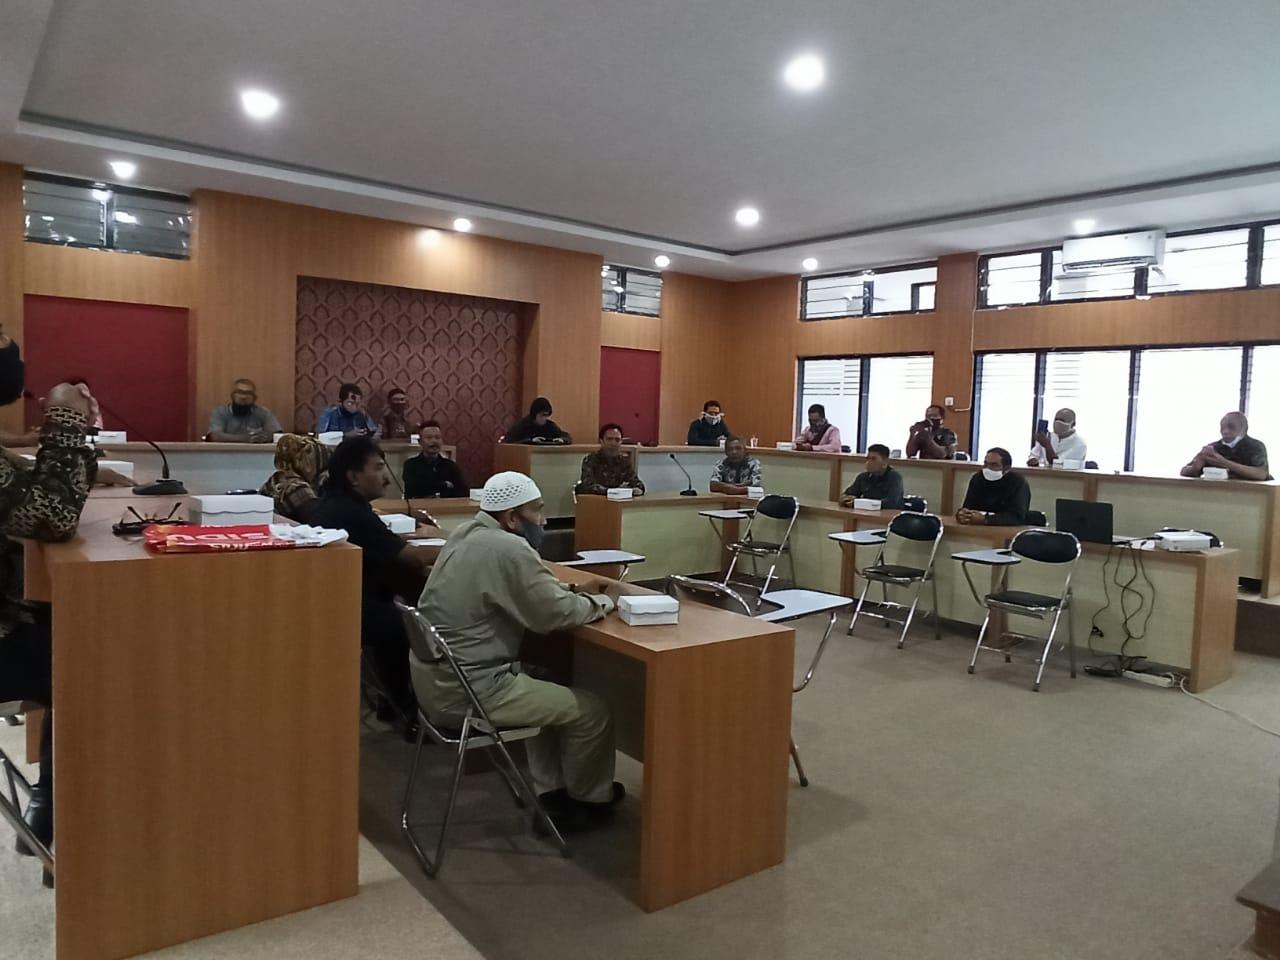 Kelas Literasi Pustakawan  Lingkungan Universitas Mataram Dalam Rangka Peningkatan Kompetensi Di Masa Pandemi Covid-19